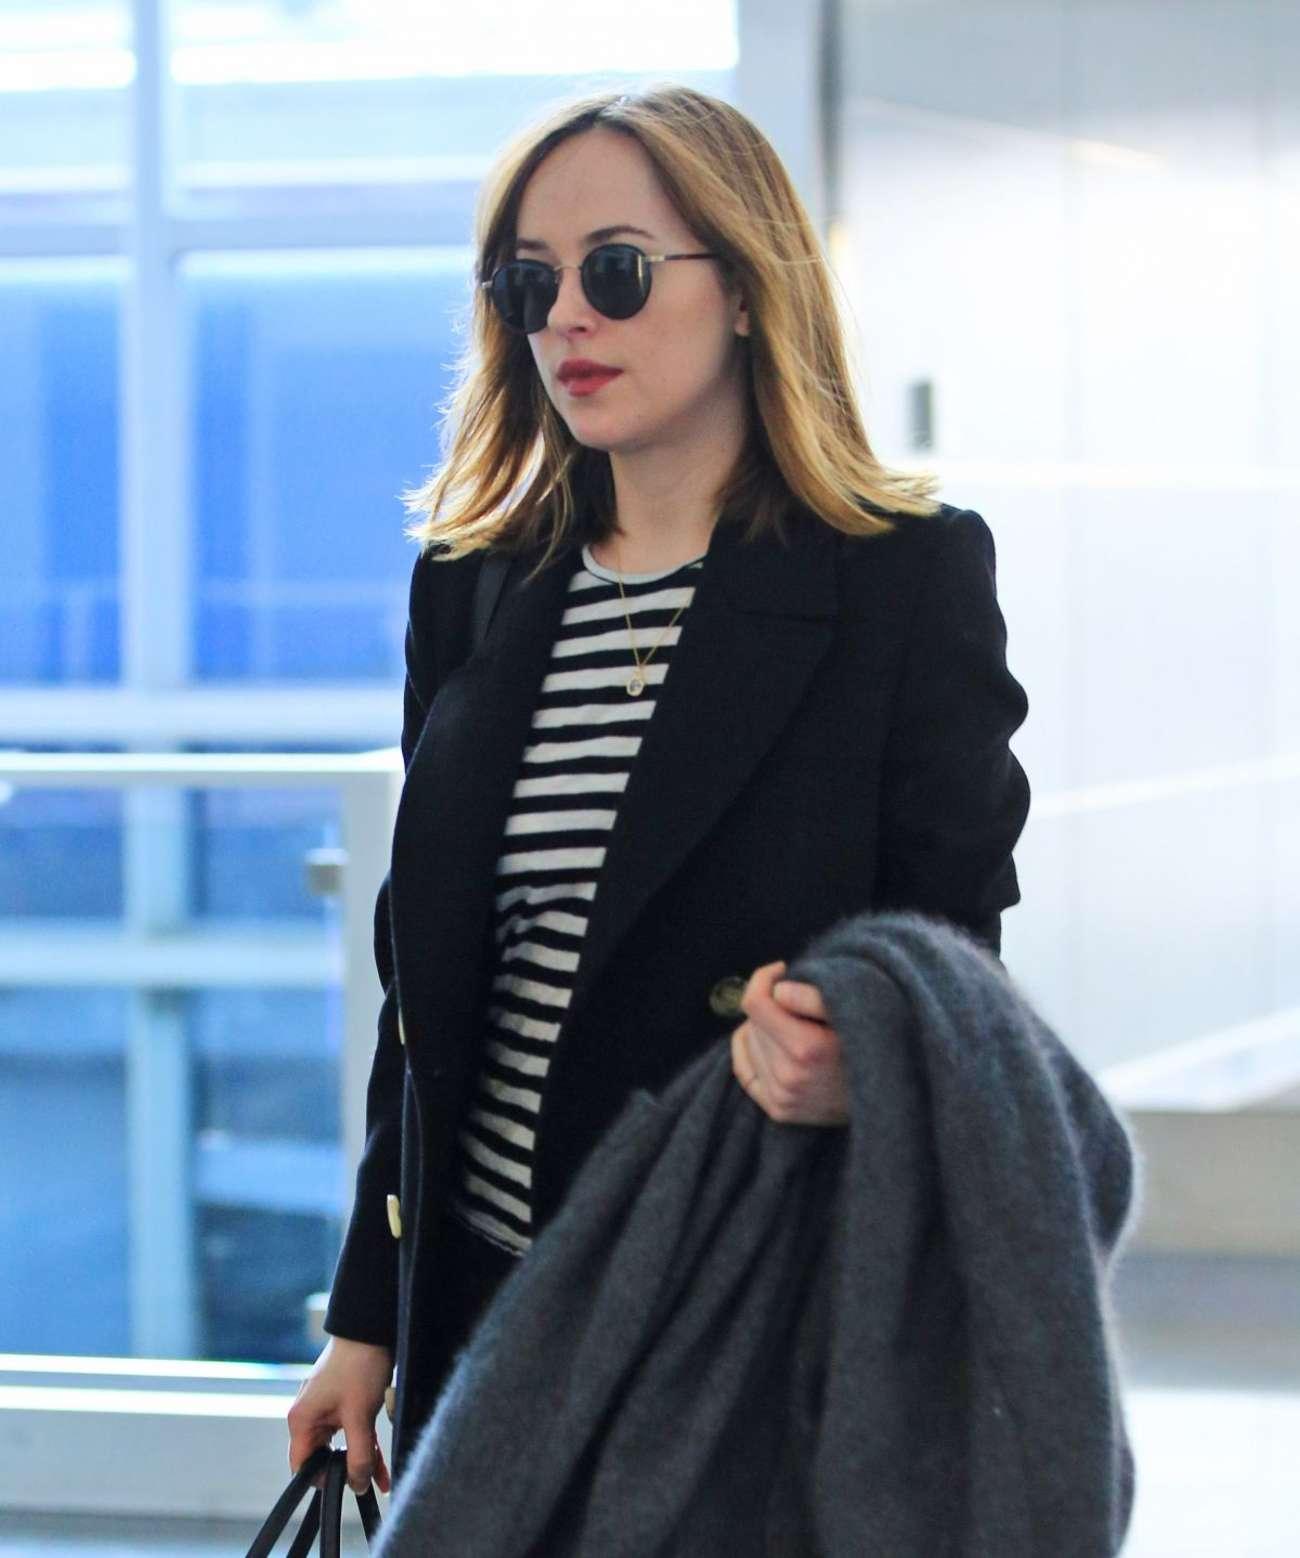 Dakota Johnson 2016 : Dakota Johnson: Arriving at JFK Airport -01